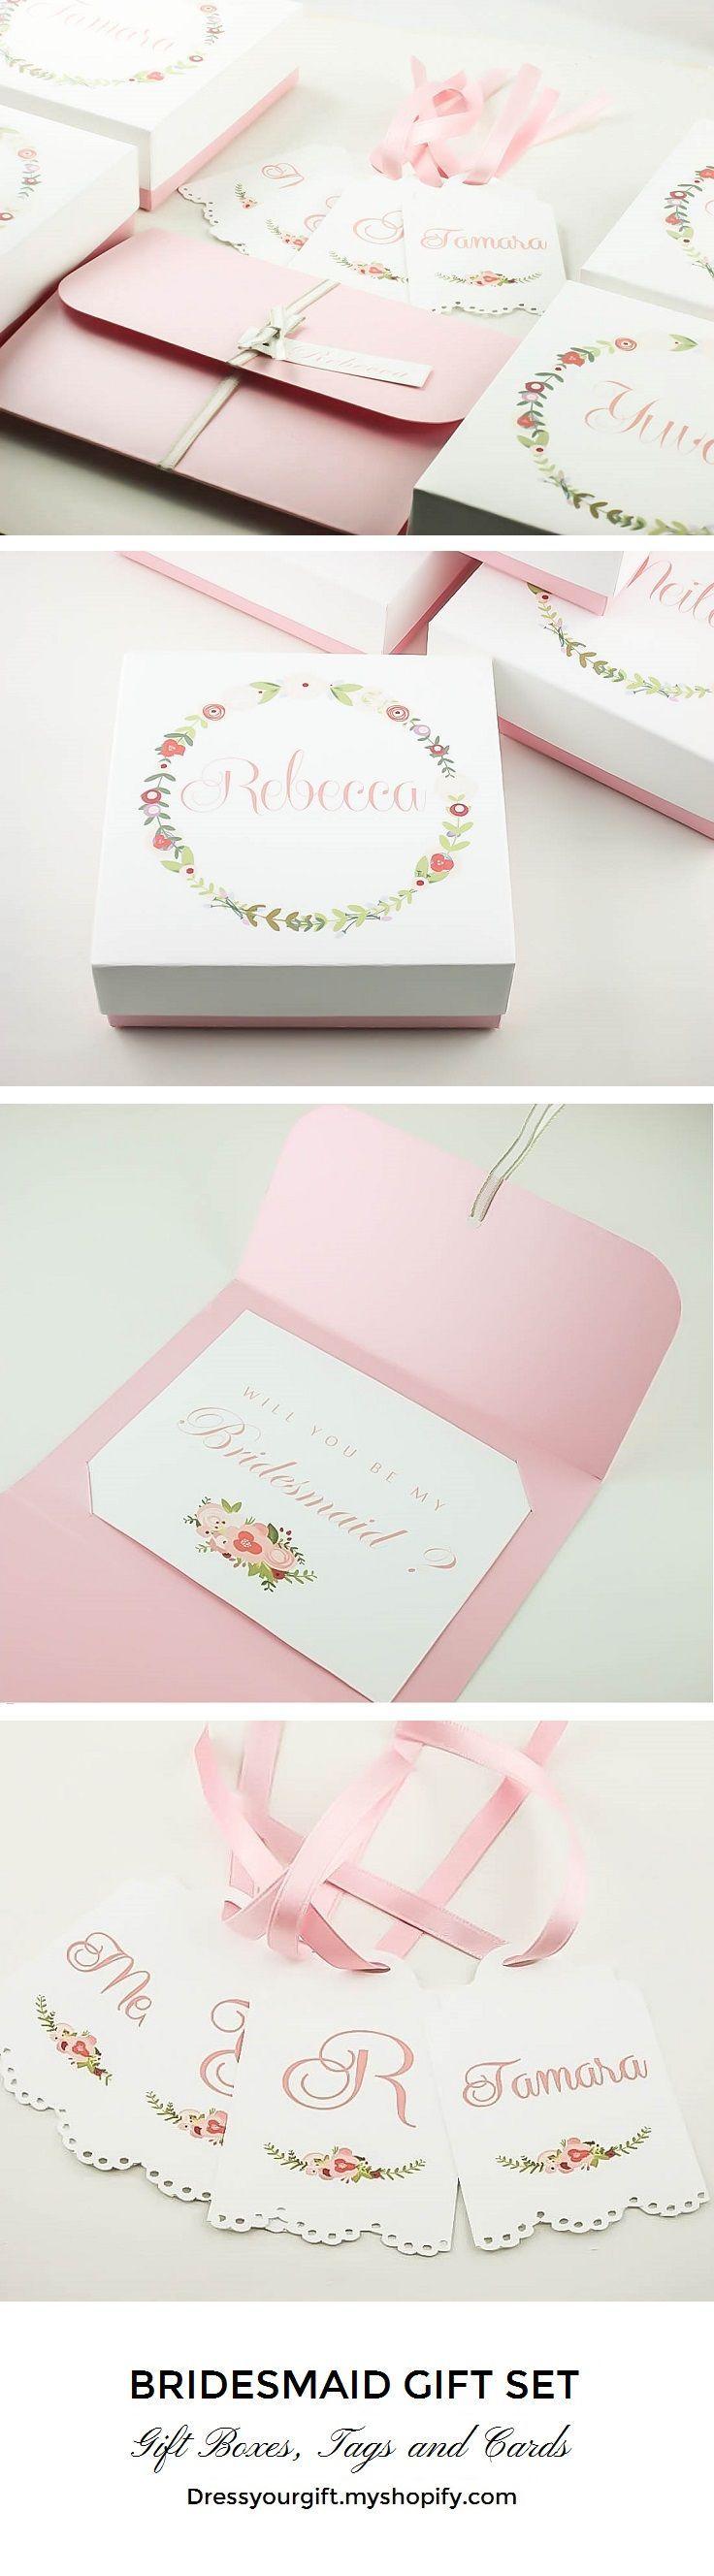 Customize your Pink Bridesmaids gifts Bridesmaid Gift Set Bridesmaid thank you gift, pink Bridal Shower cards and tags. #demoiselledhonneur #damadehonor #brautjungfern #trauzeugin Dama de honor caja, Demoiselle honneur cadeau, Brautjungfer fragen, Trauzeugin geschenk